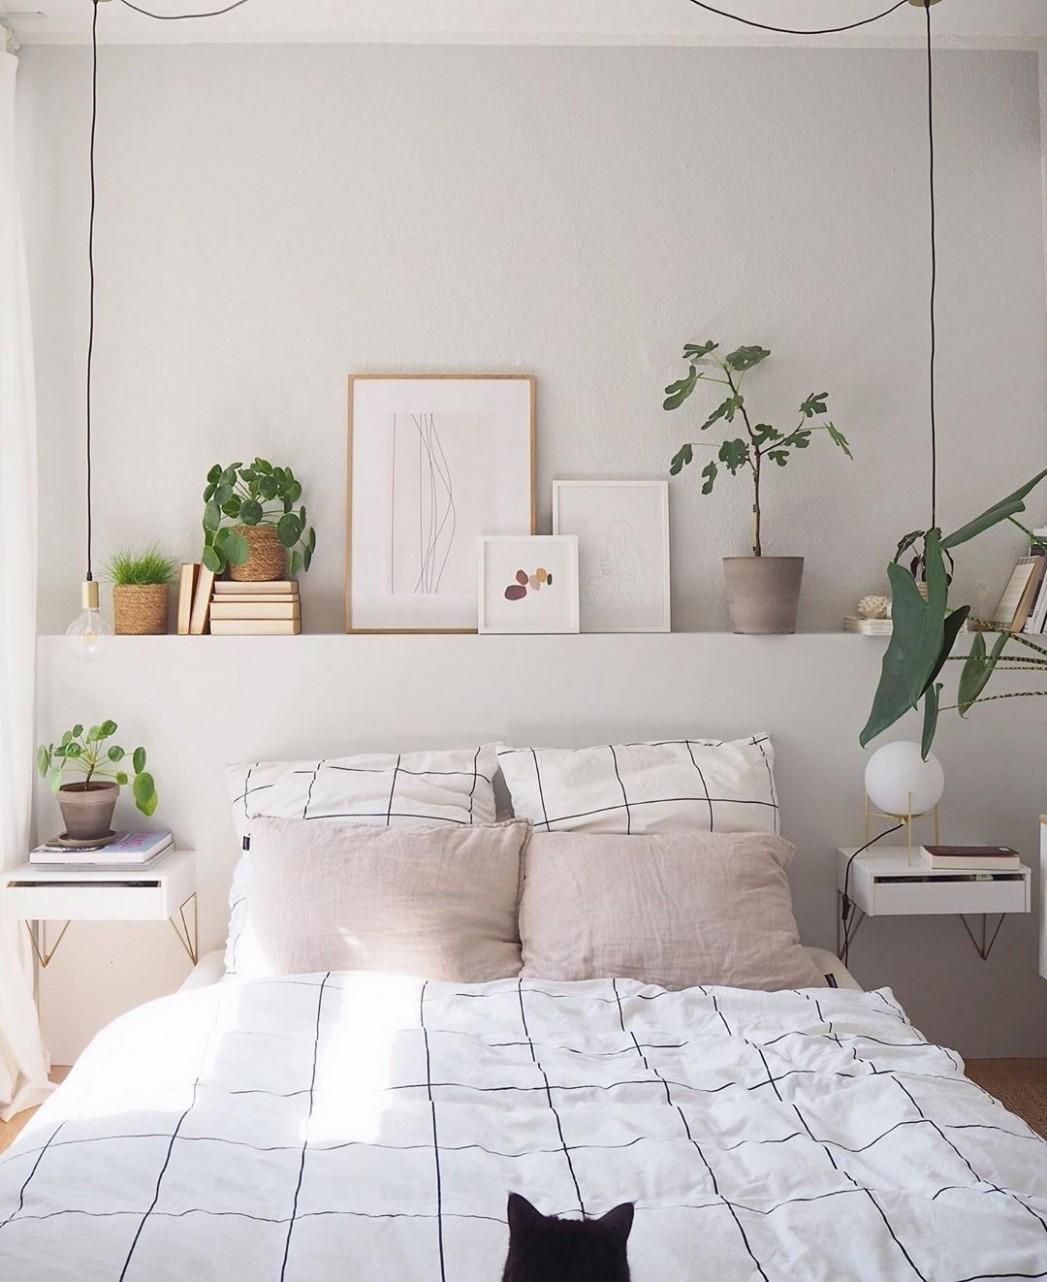 ideas for bedroom decor #bedroom decor ebay uk #bedroom decor  - Bedroom Ideas Ebay